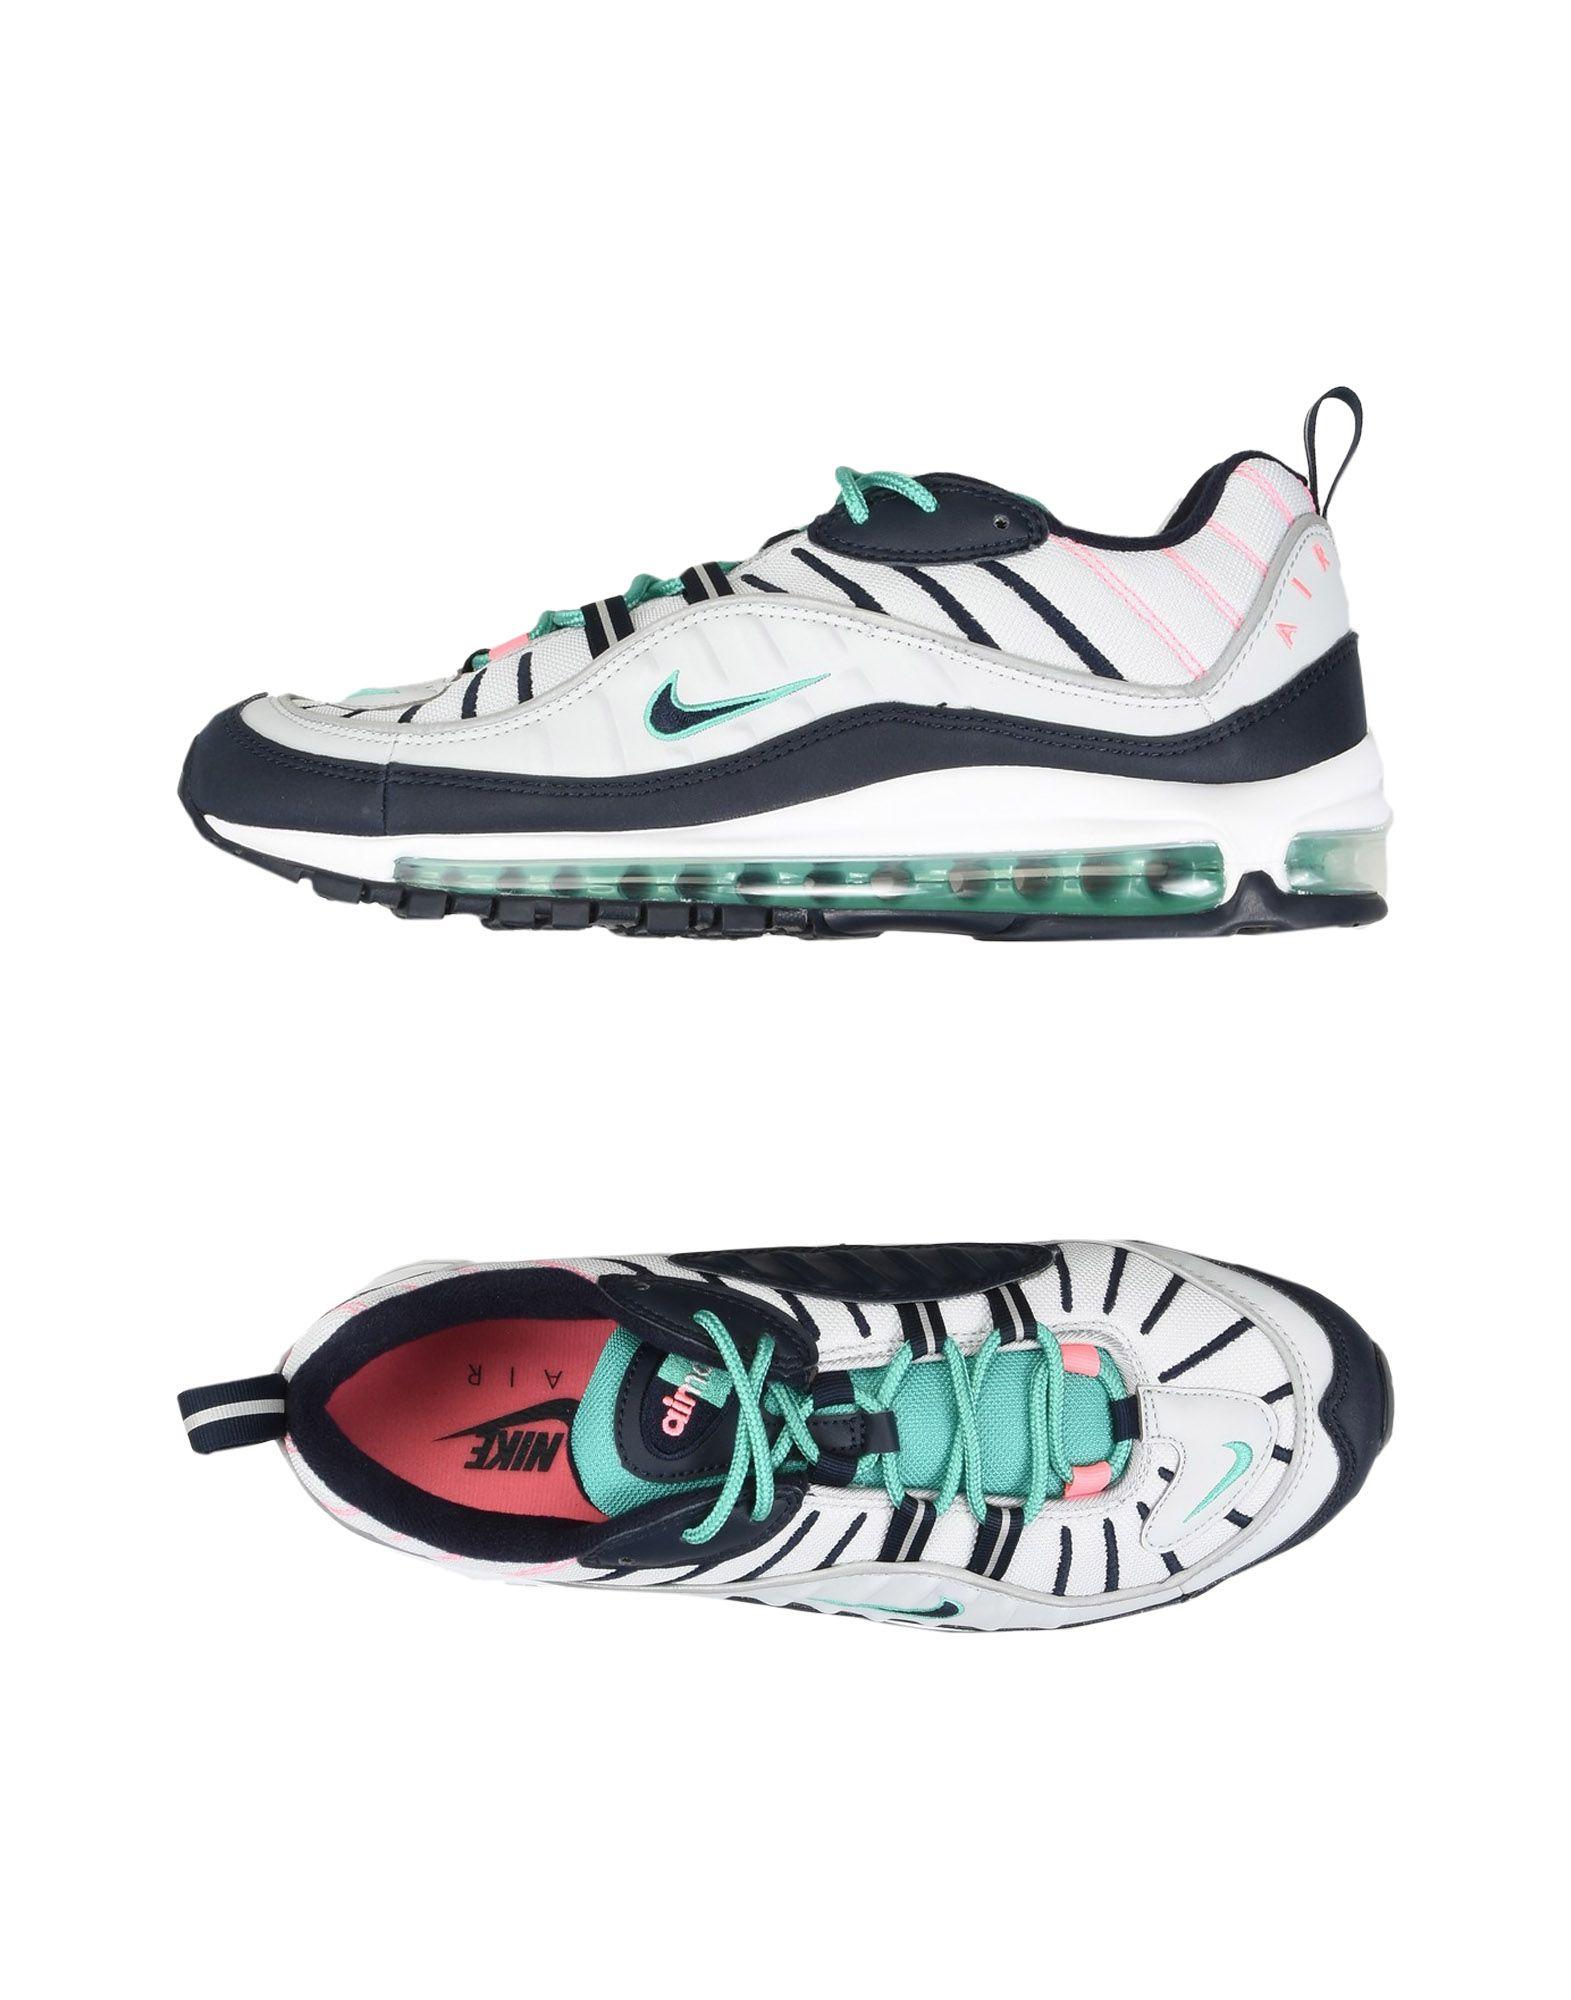 Scarpe da Ginnastica Nike Nike Air Max 11492640QO 98 - Uomo - 11492640QO Max ab0ce4